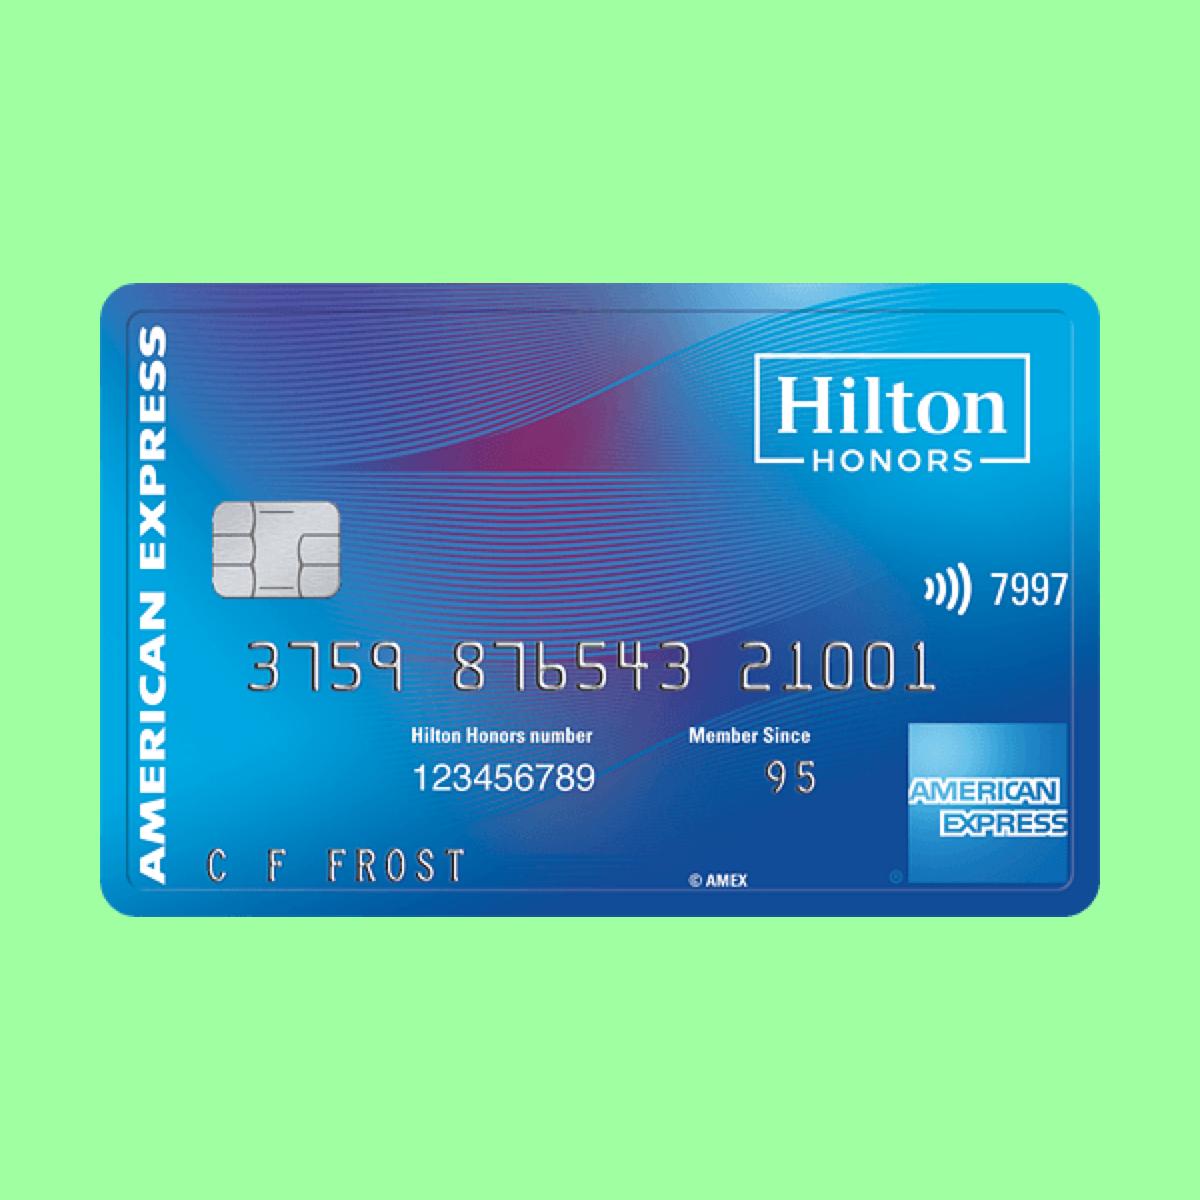 Hilton Credit Card Card Review Hilton Points Calculator Hilton Amazon Credit Card Amex Card